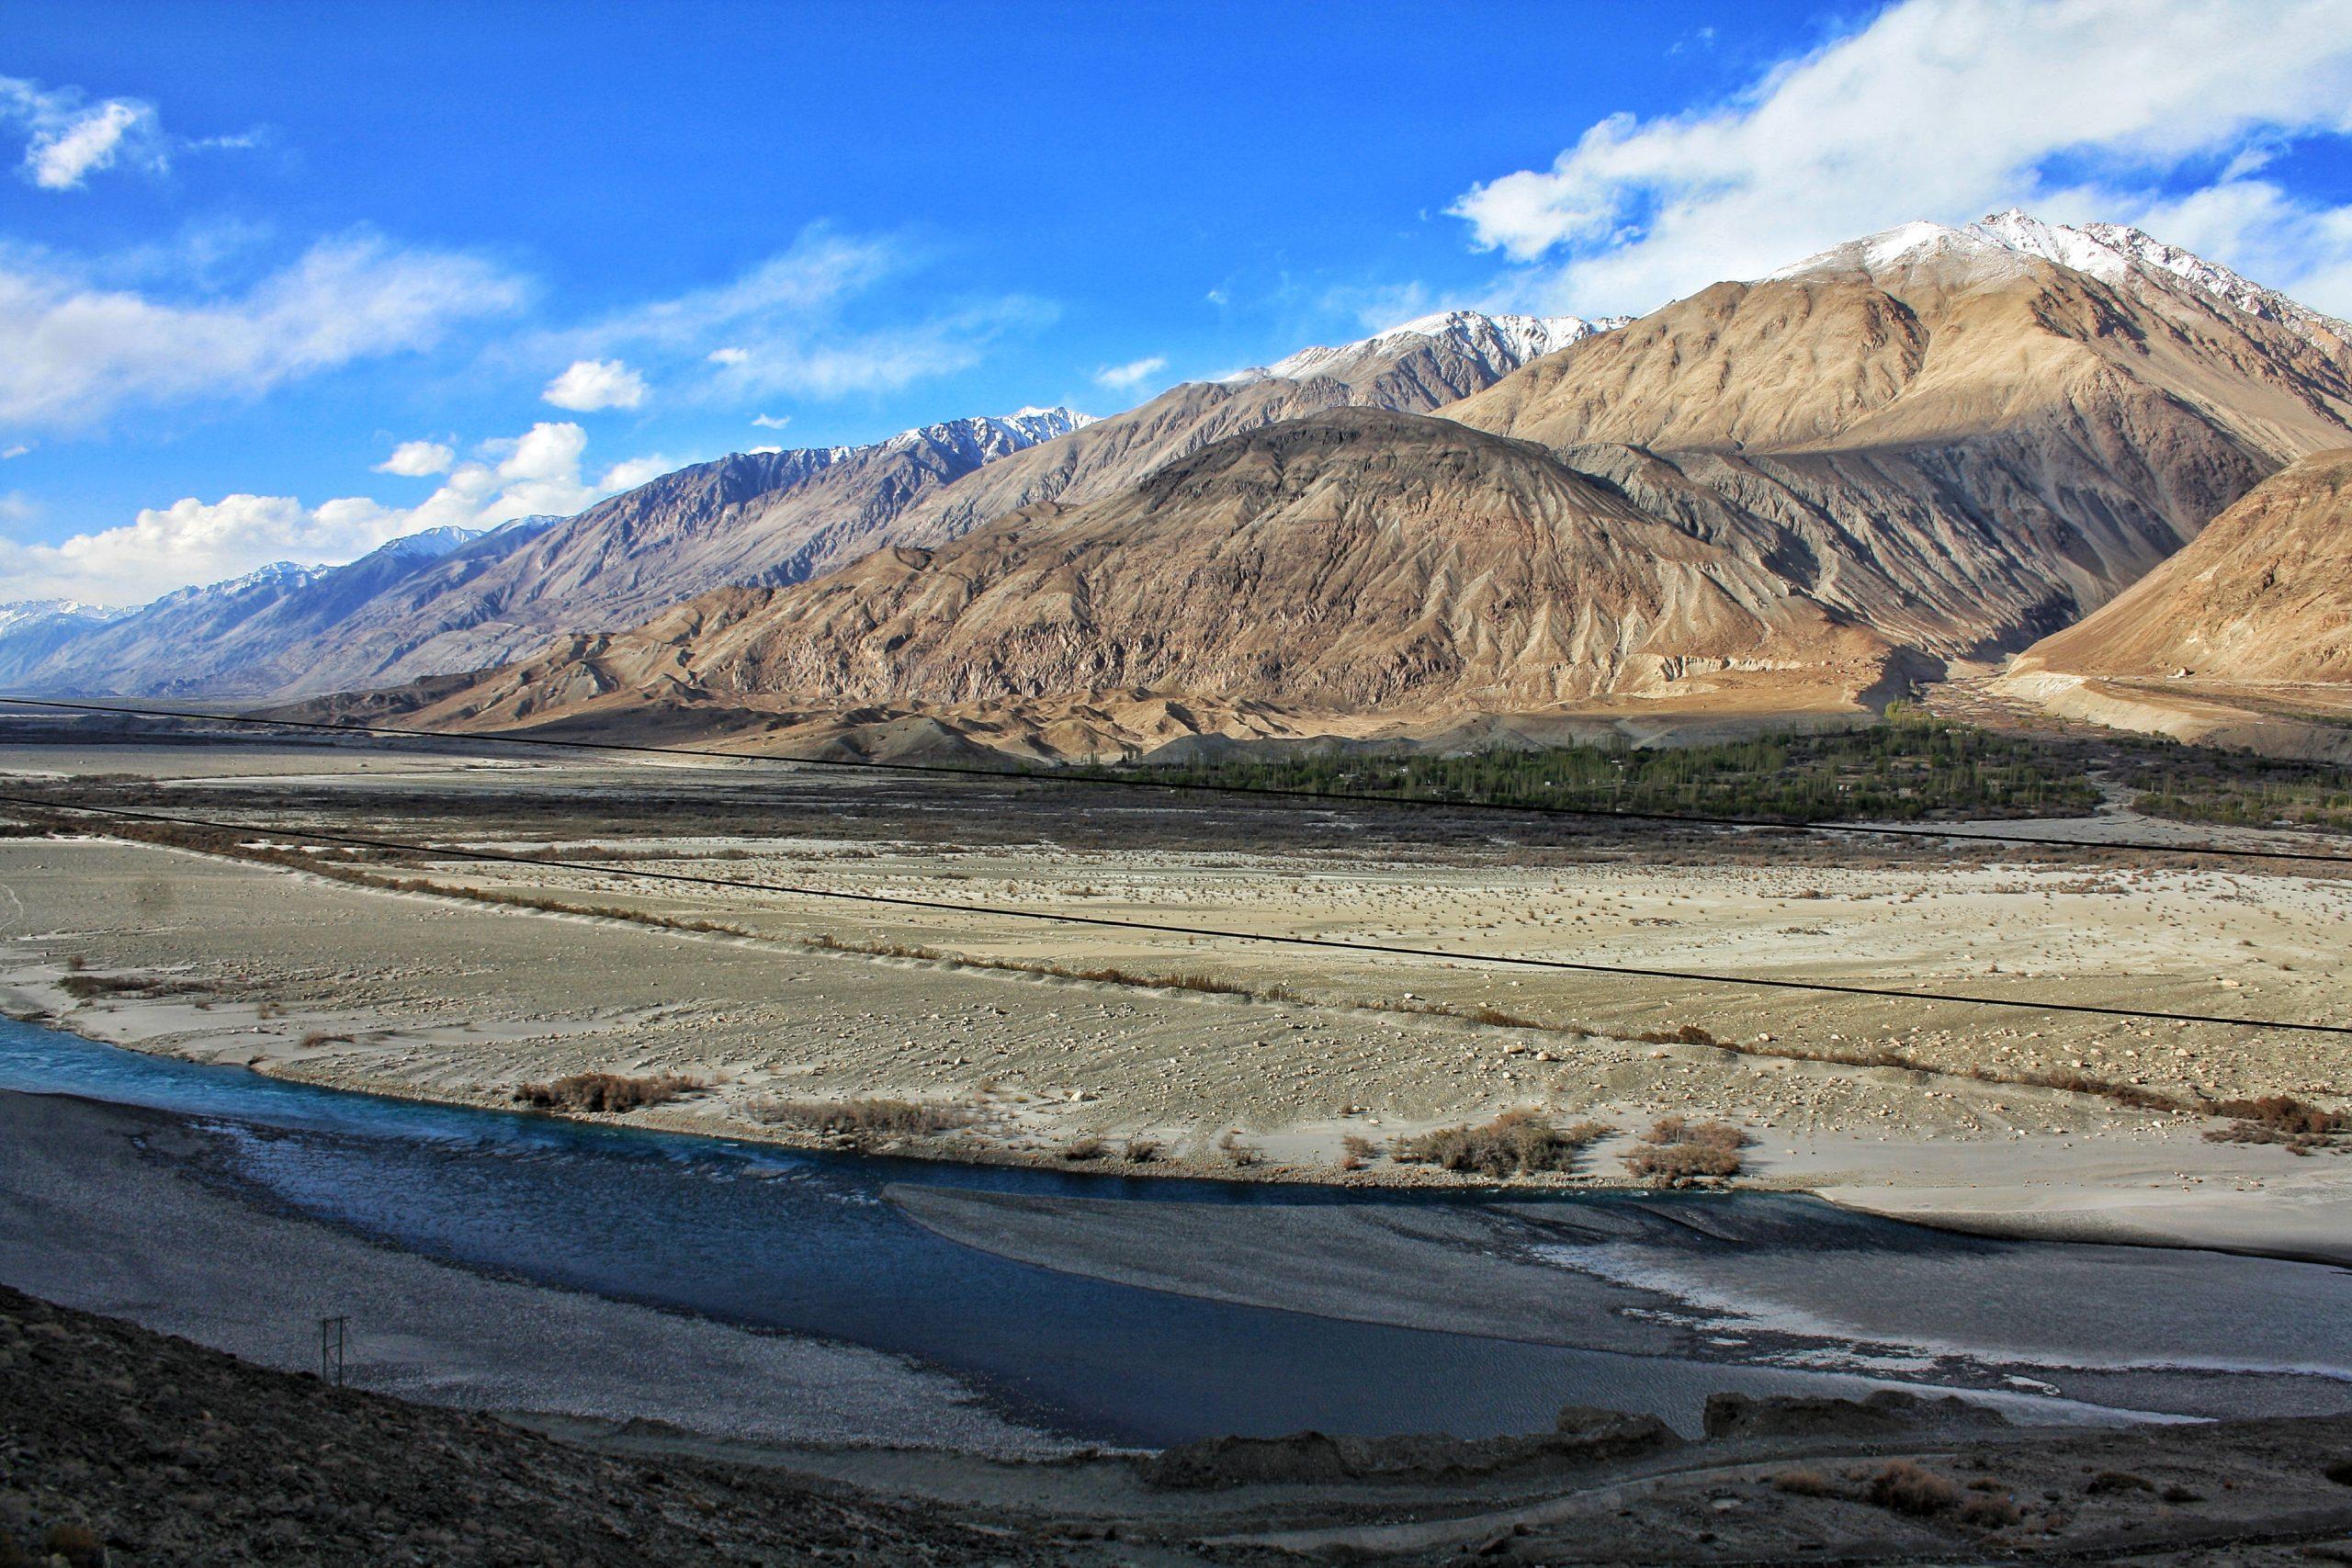 Mountain passes of Leh